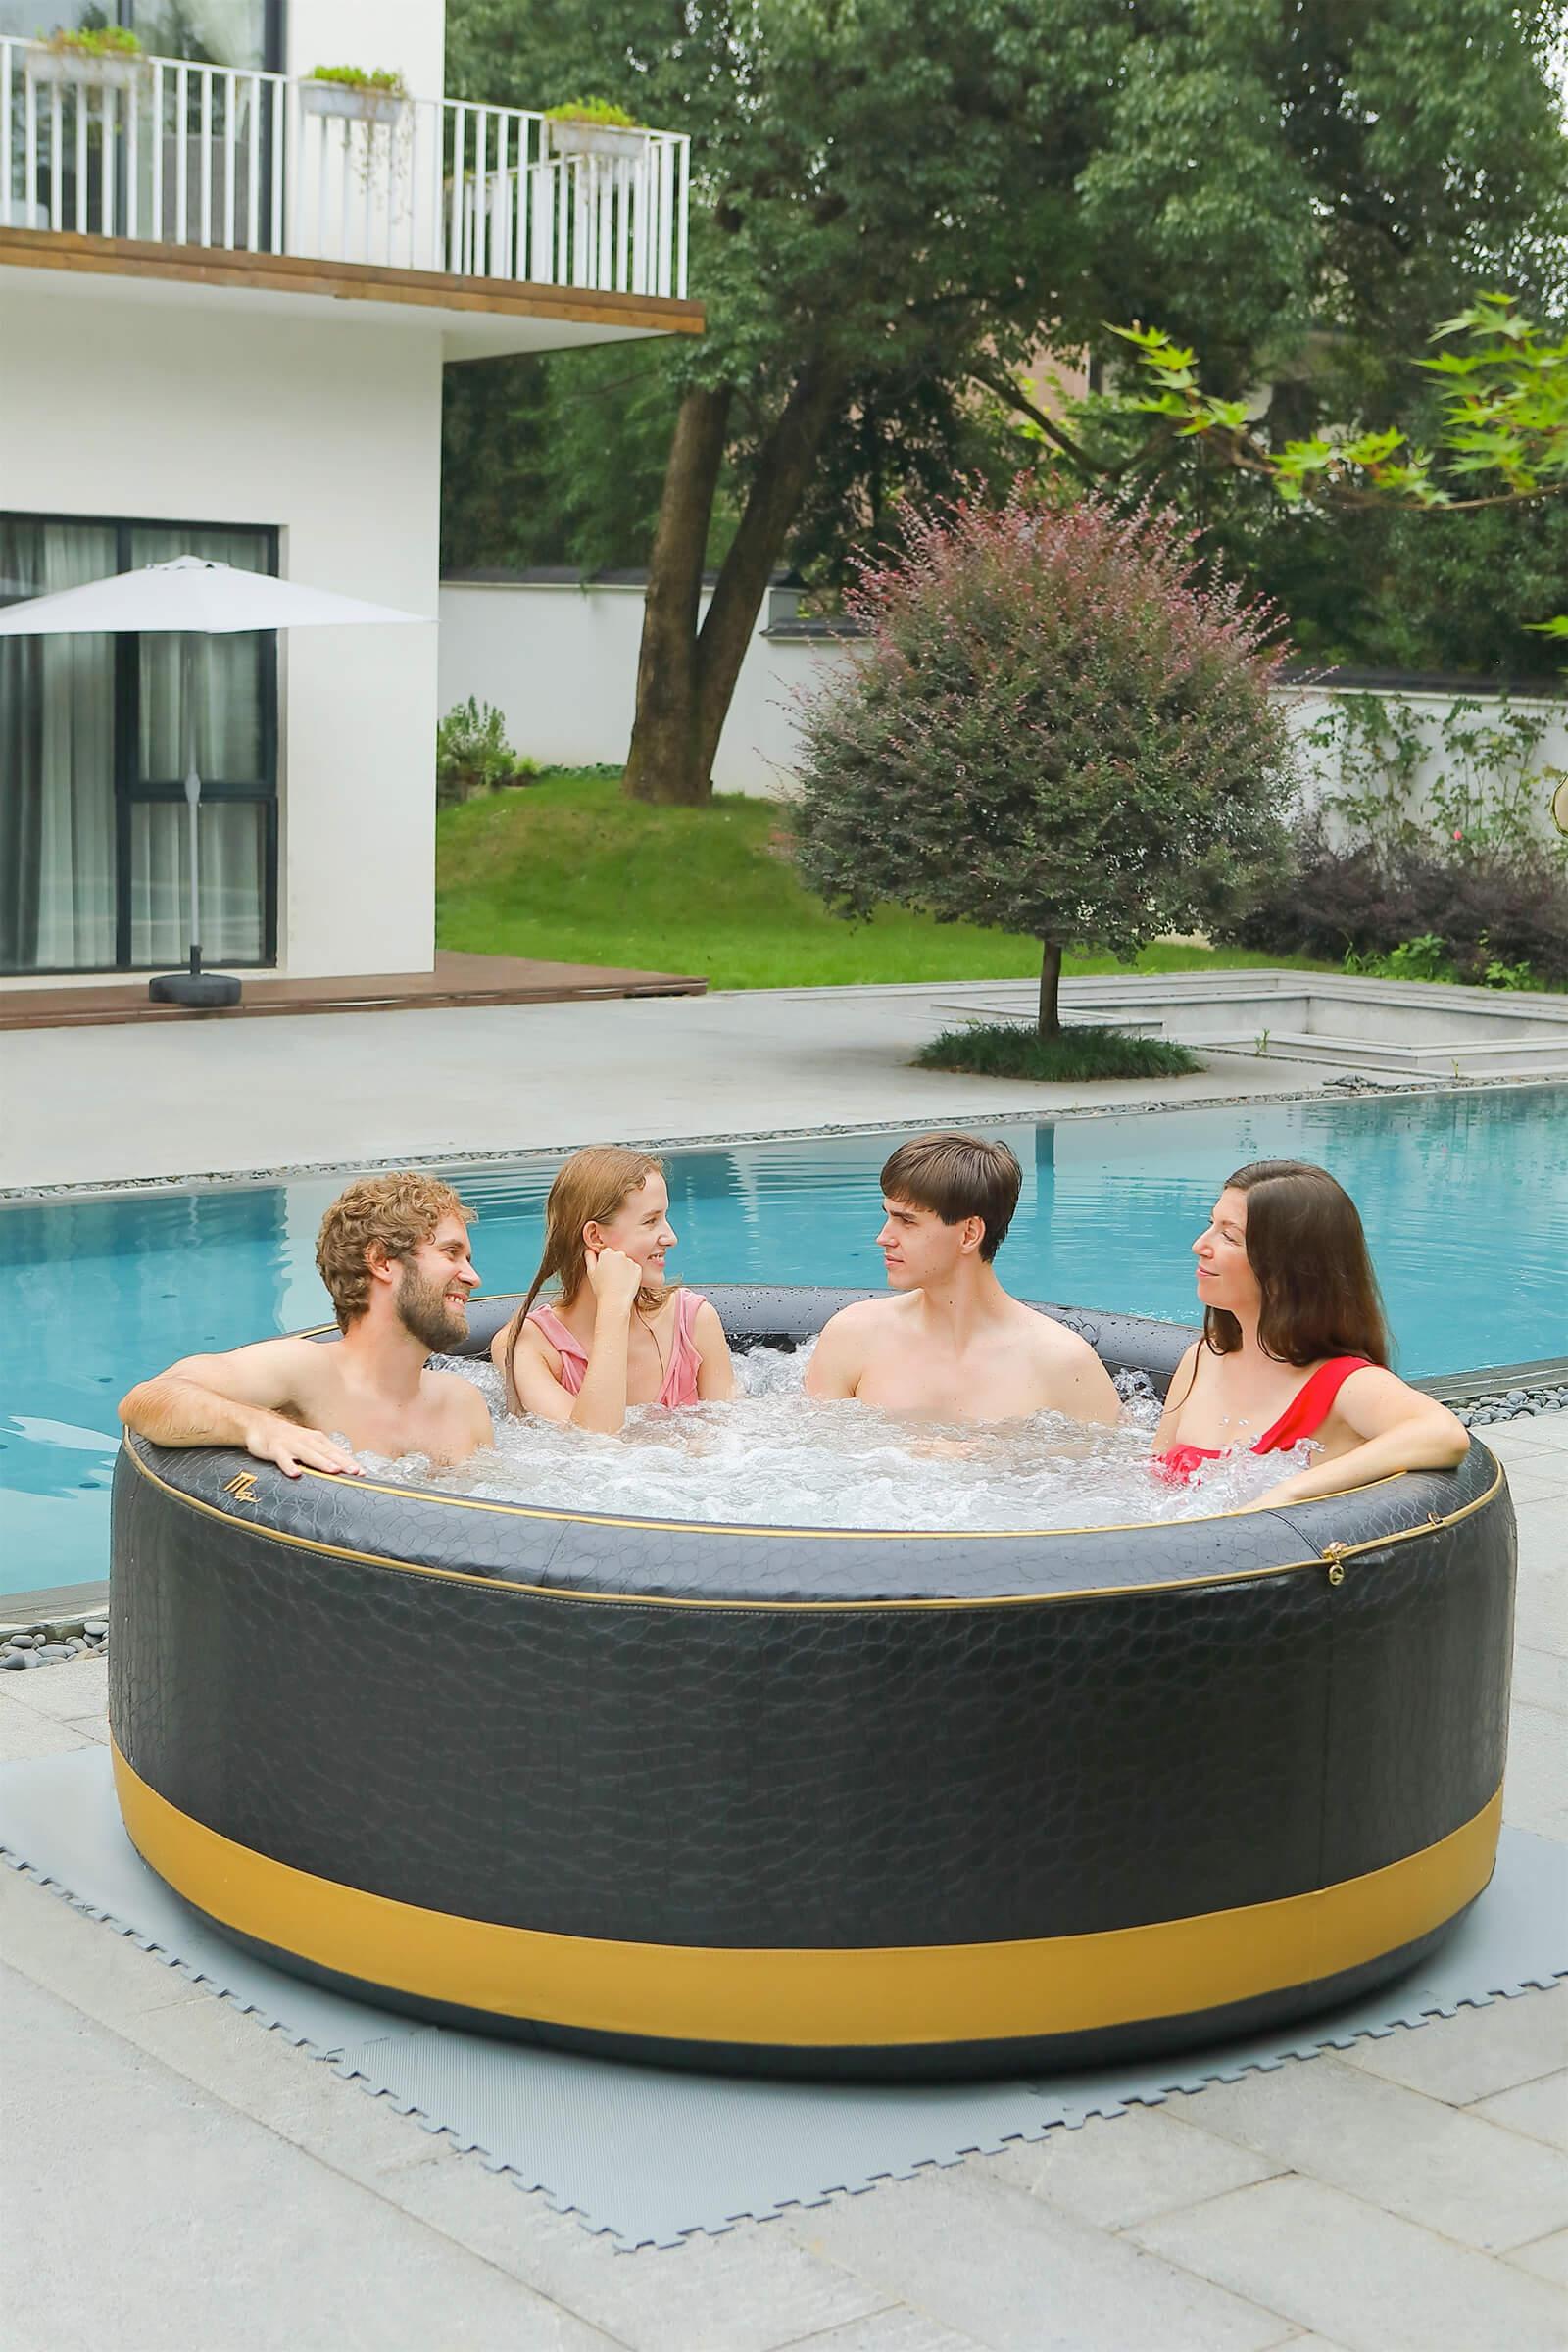 MSpa Premium 6 Personen Whirlpool Luxury Exotic P-EX069 Indoor + Outdoor Pool